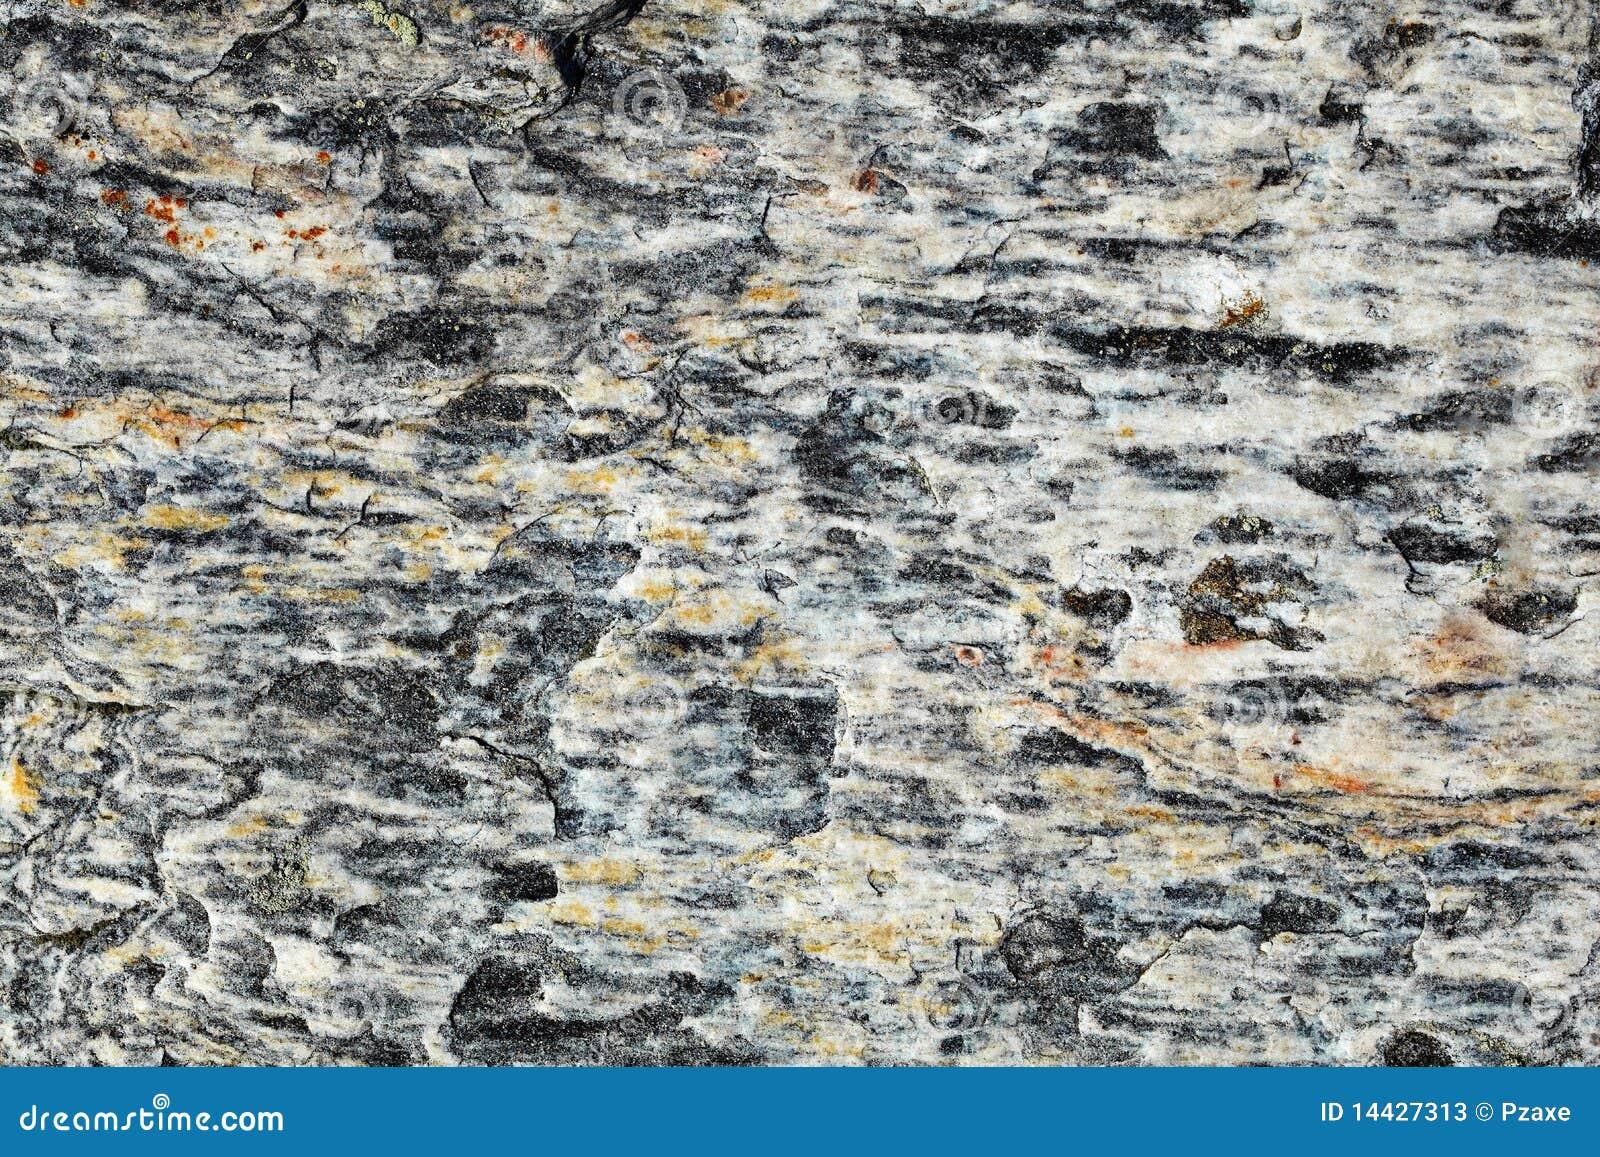 Natural Stone Granite : Natural surface granite stone royalty free stock